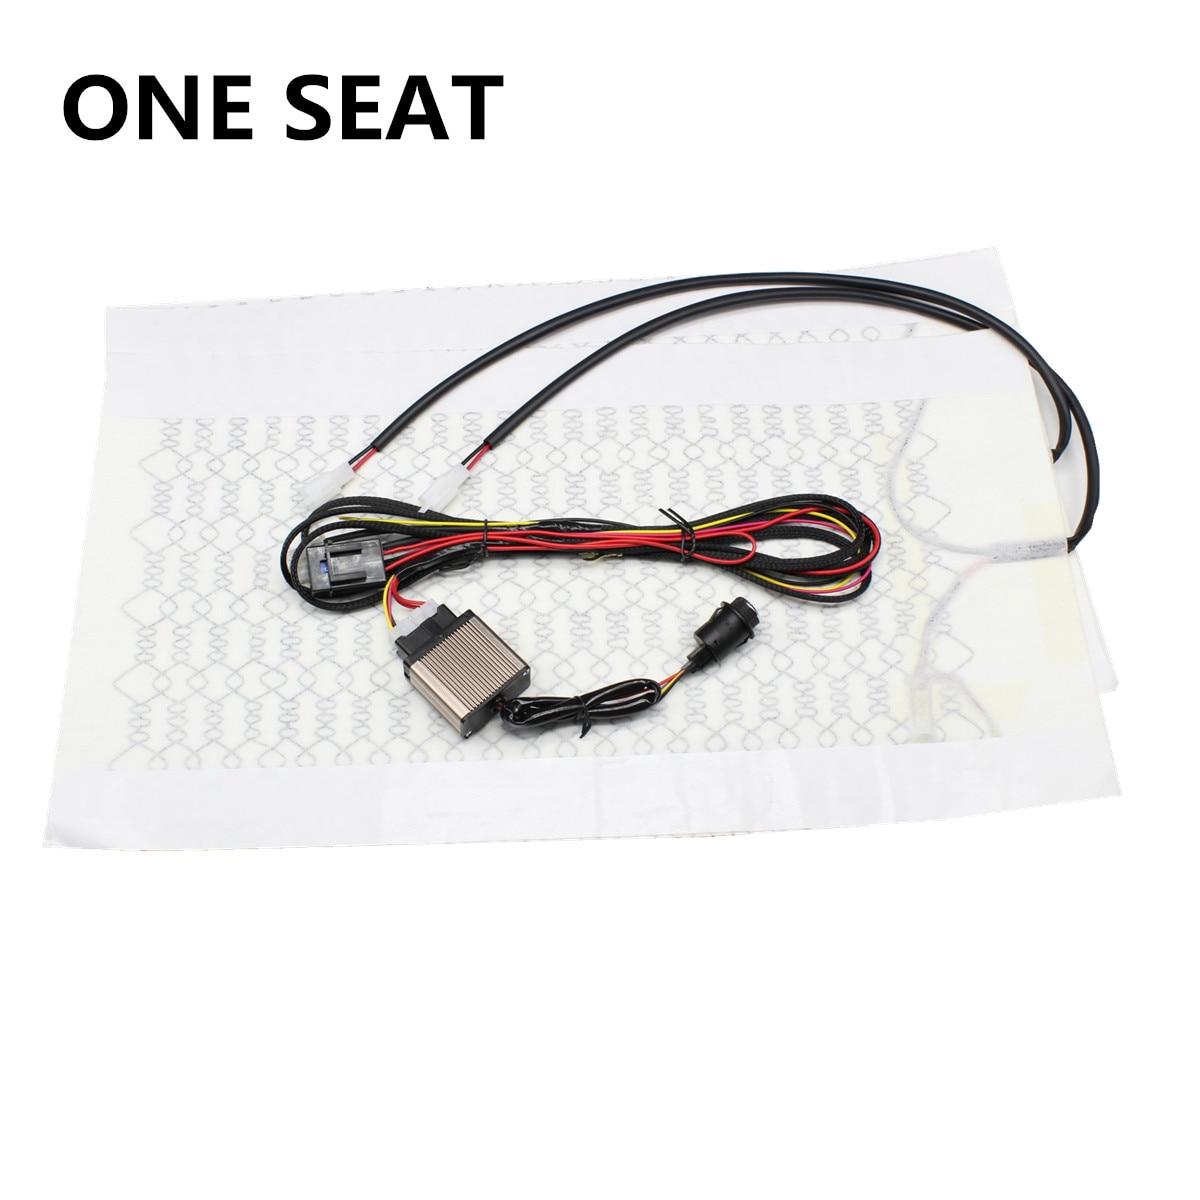 6 Level 12V Carbon Fiber Universal Car Heated heating Heater Seat Pads Winter